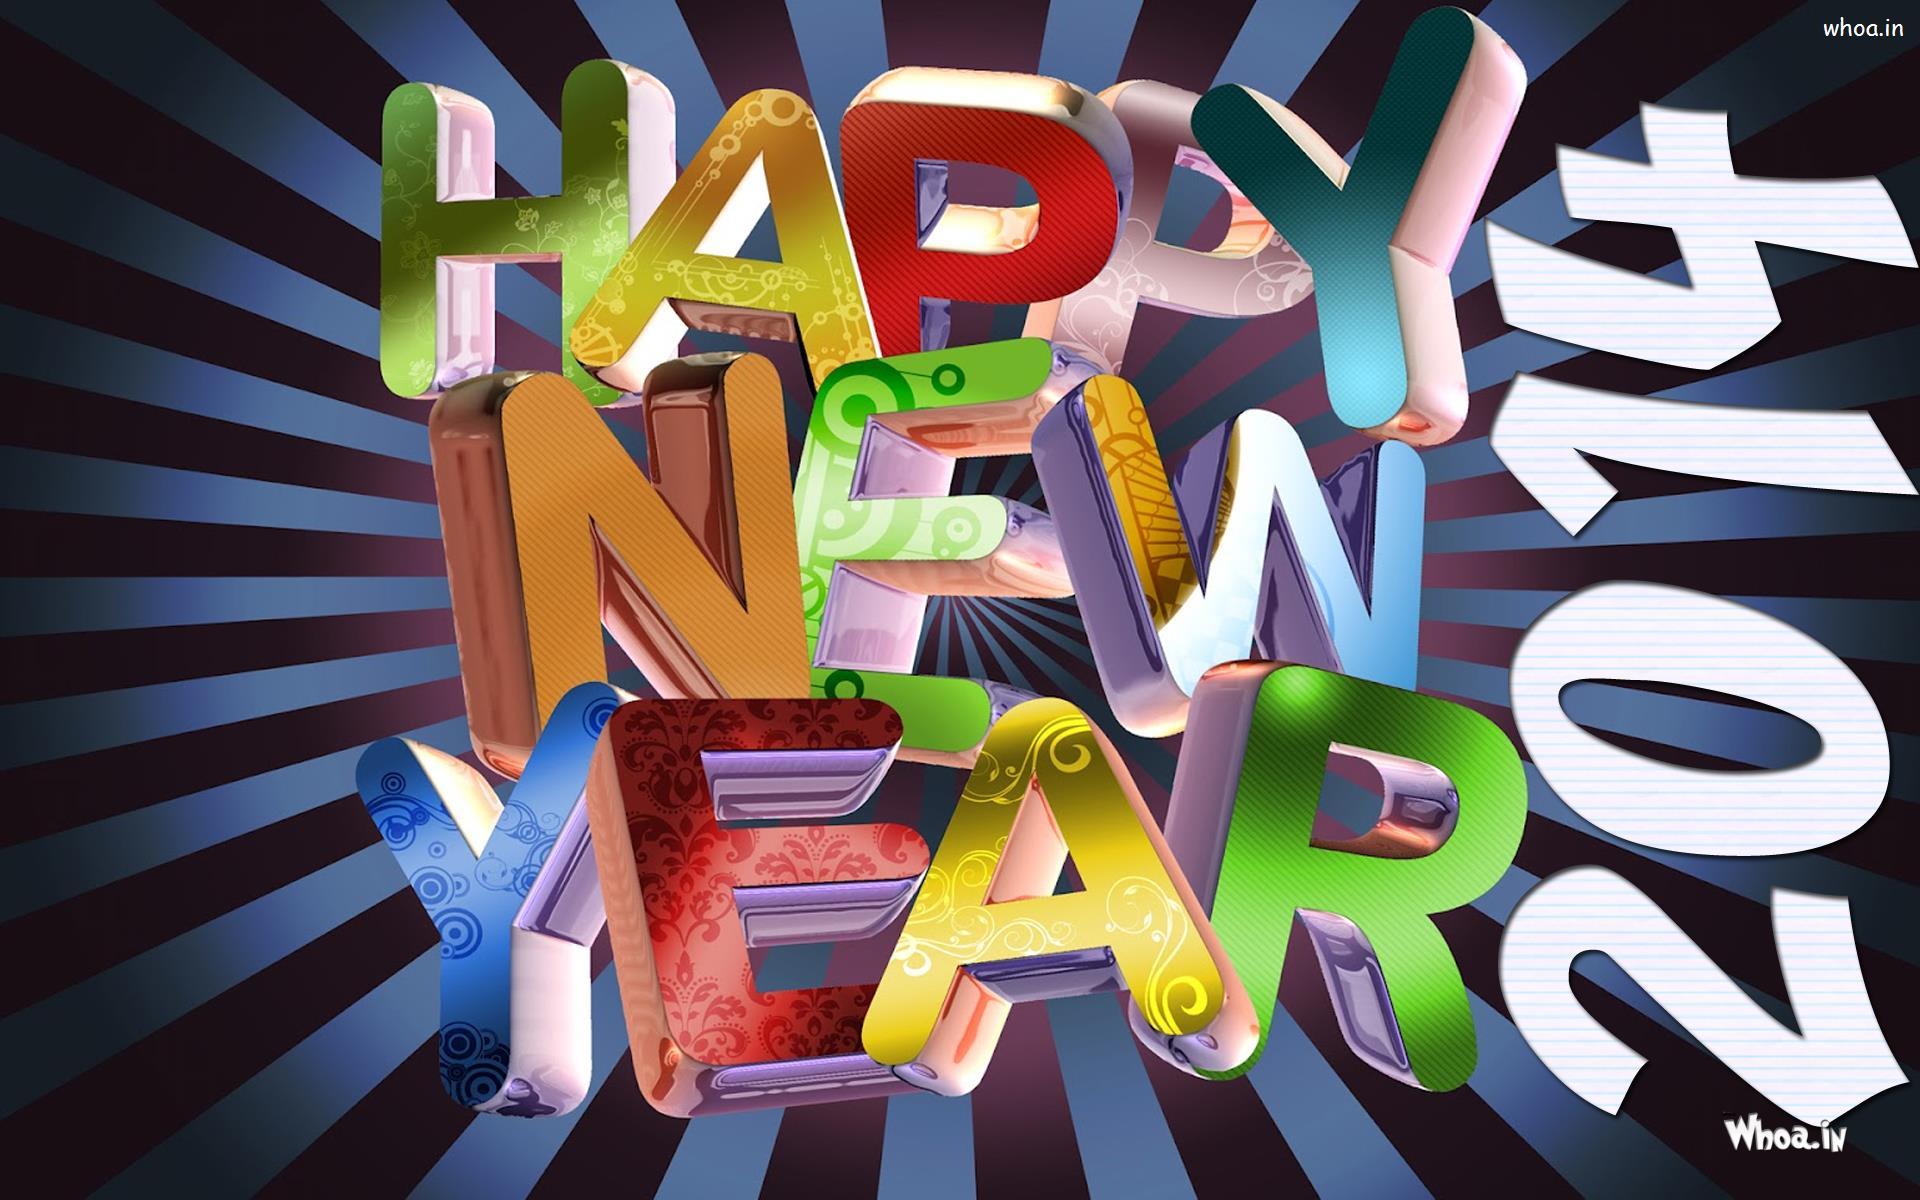 happy new year 2014 hd wallpaper #2